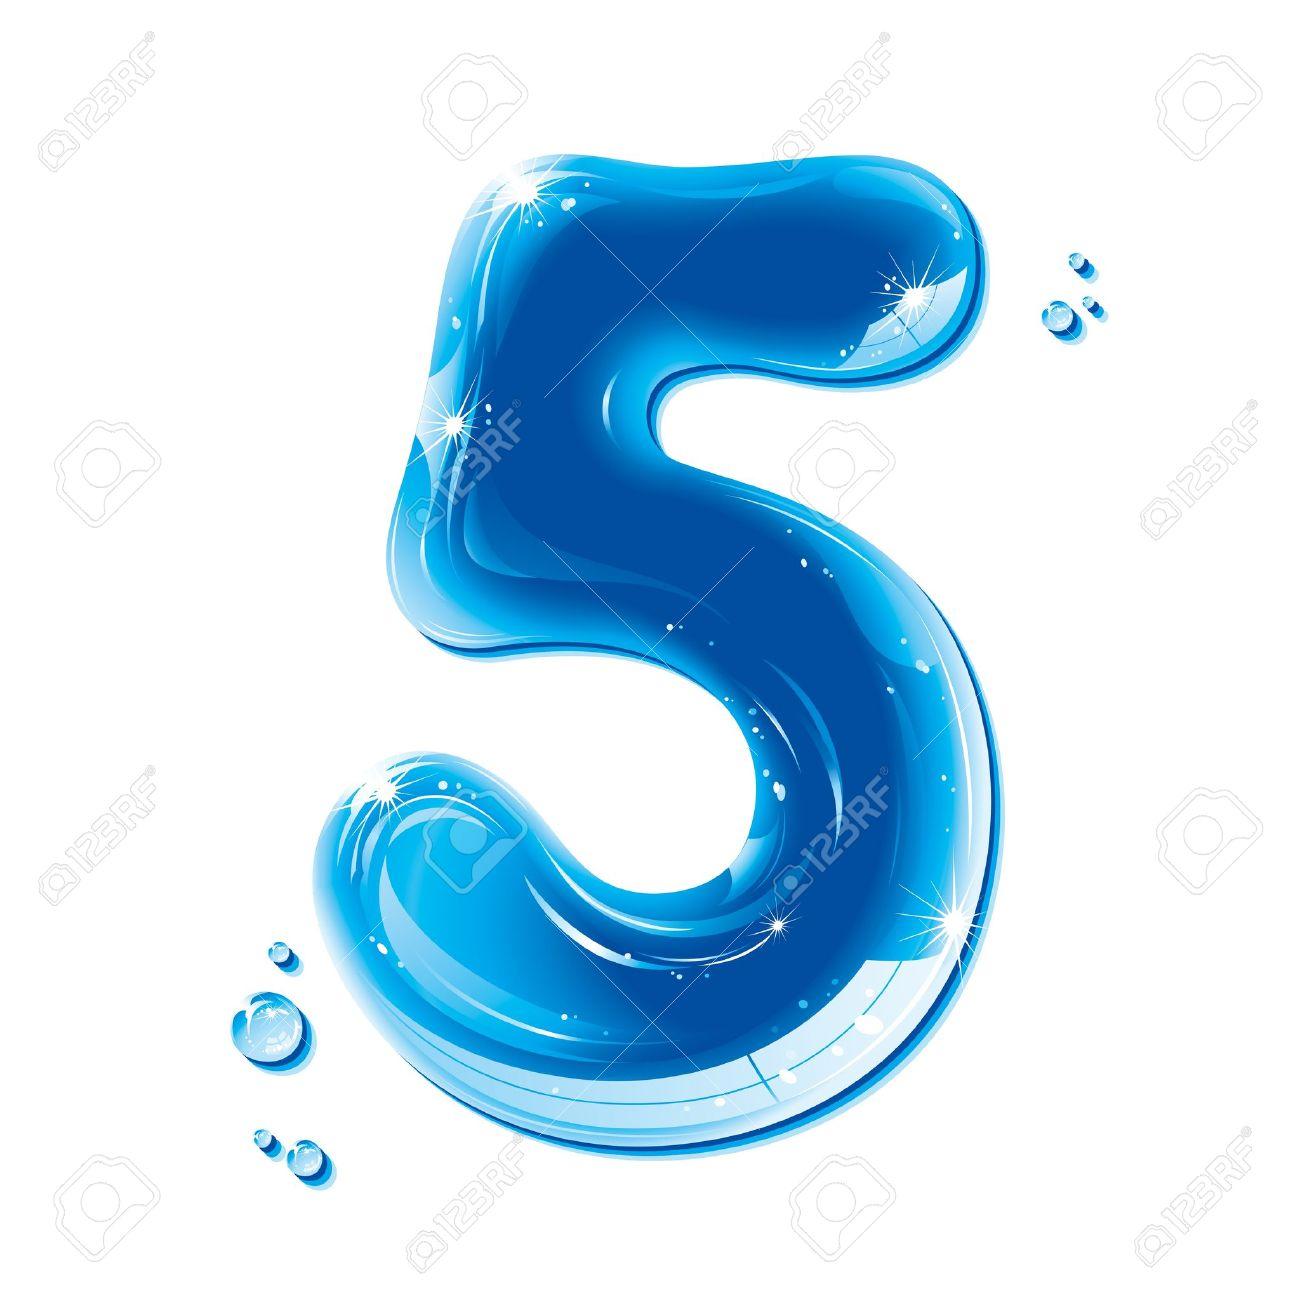 ABC series - Water Liquid Numbers - Number Five - 11237181